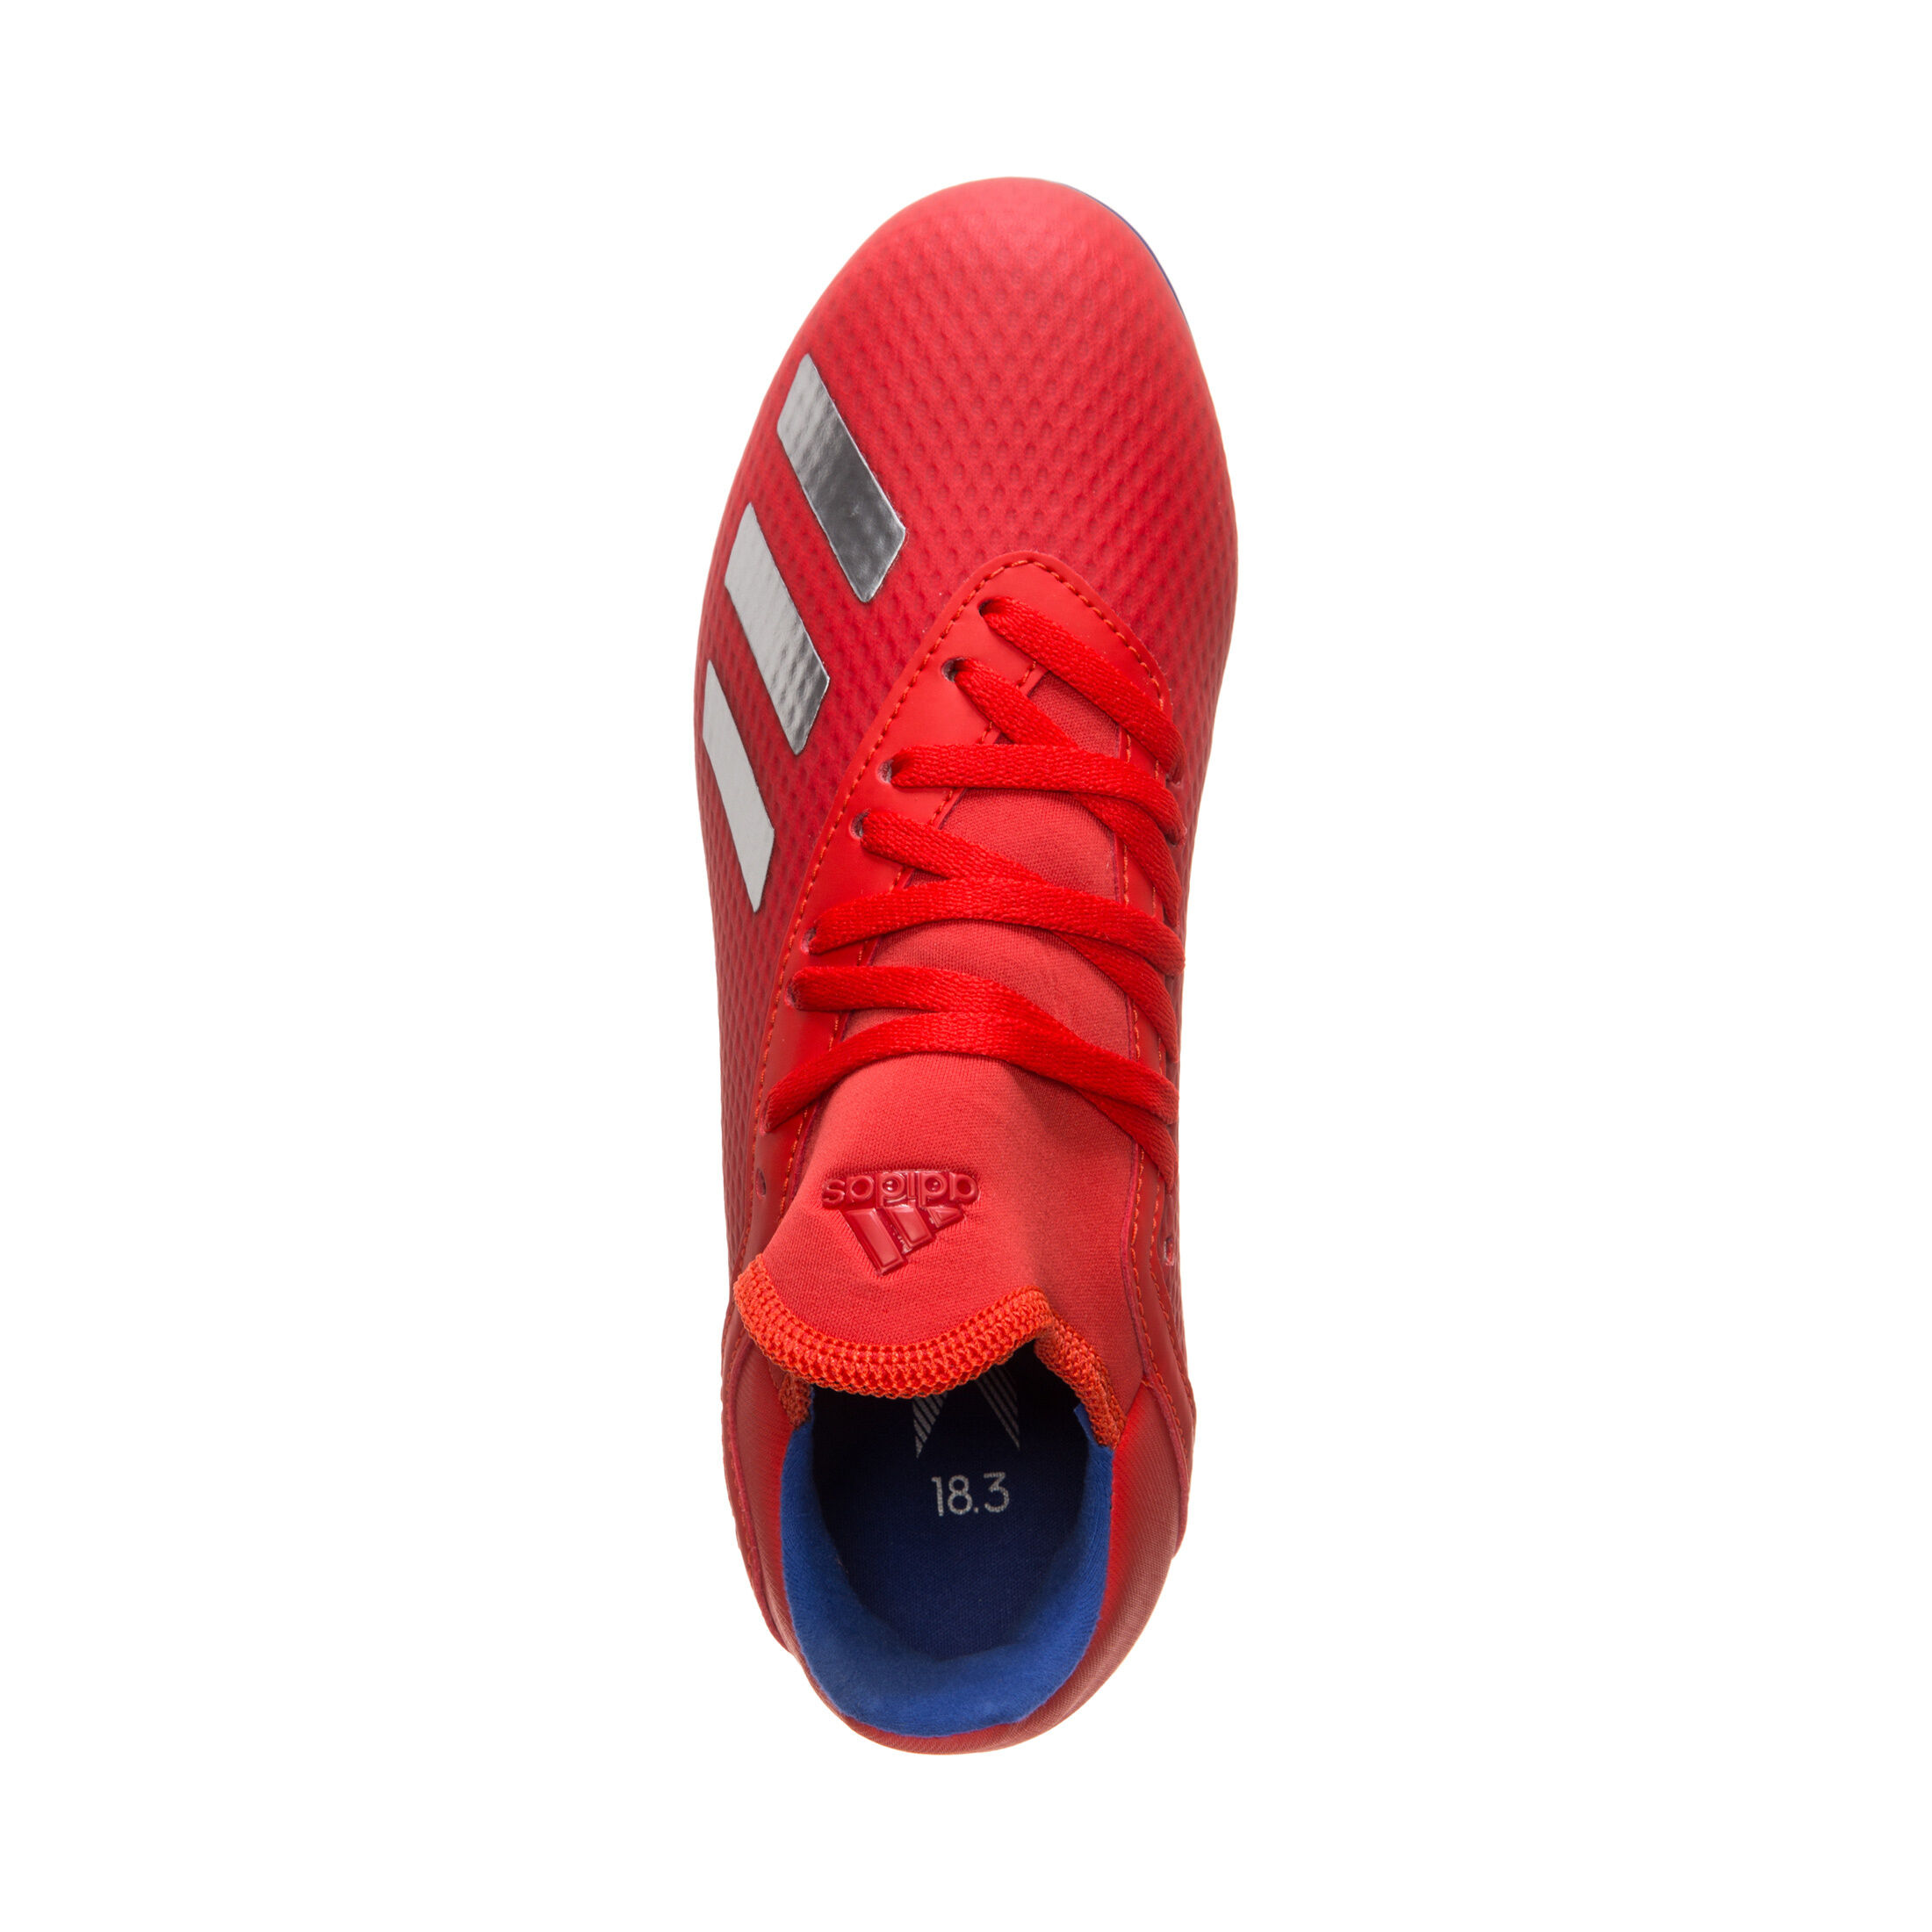 adidas Performance X 18.3 AG Fußballschuh Kinder bei OUTFITTER